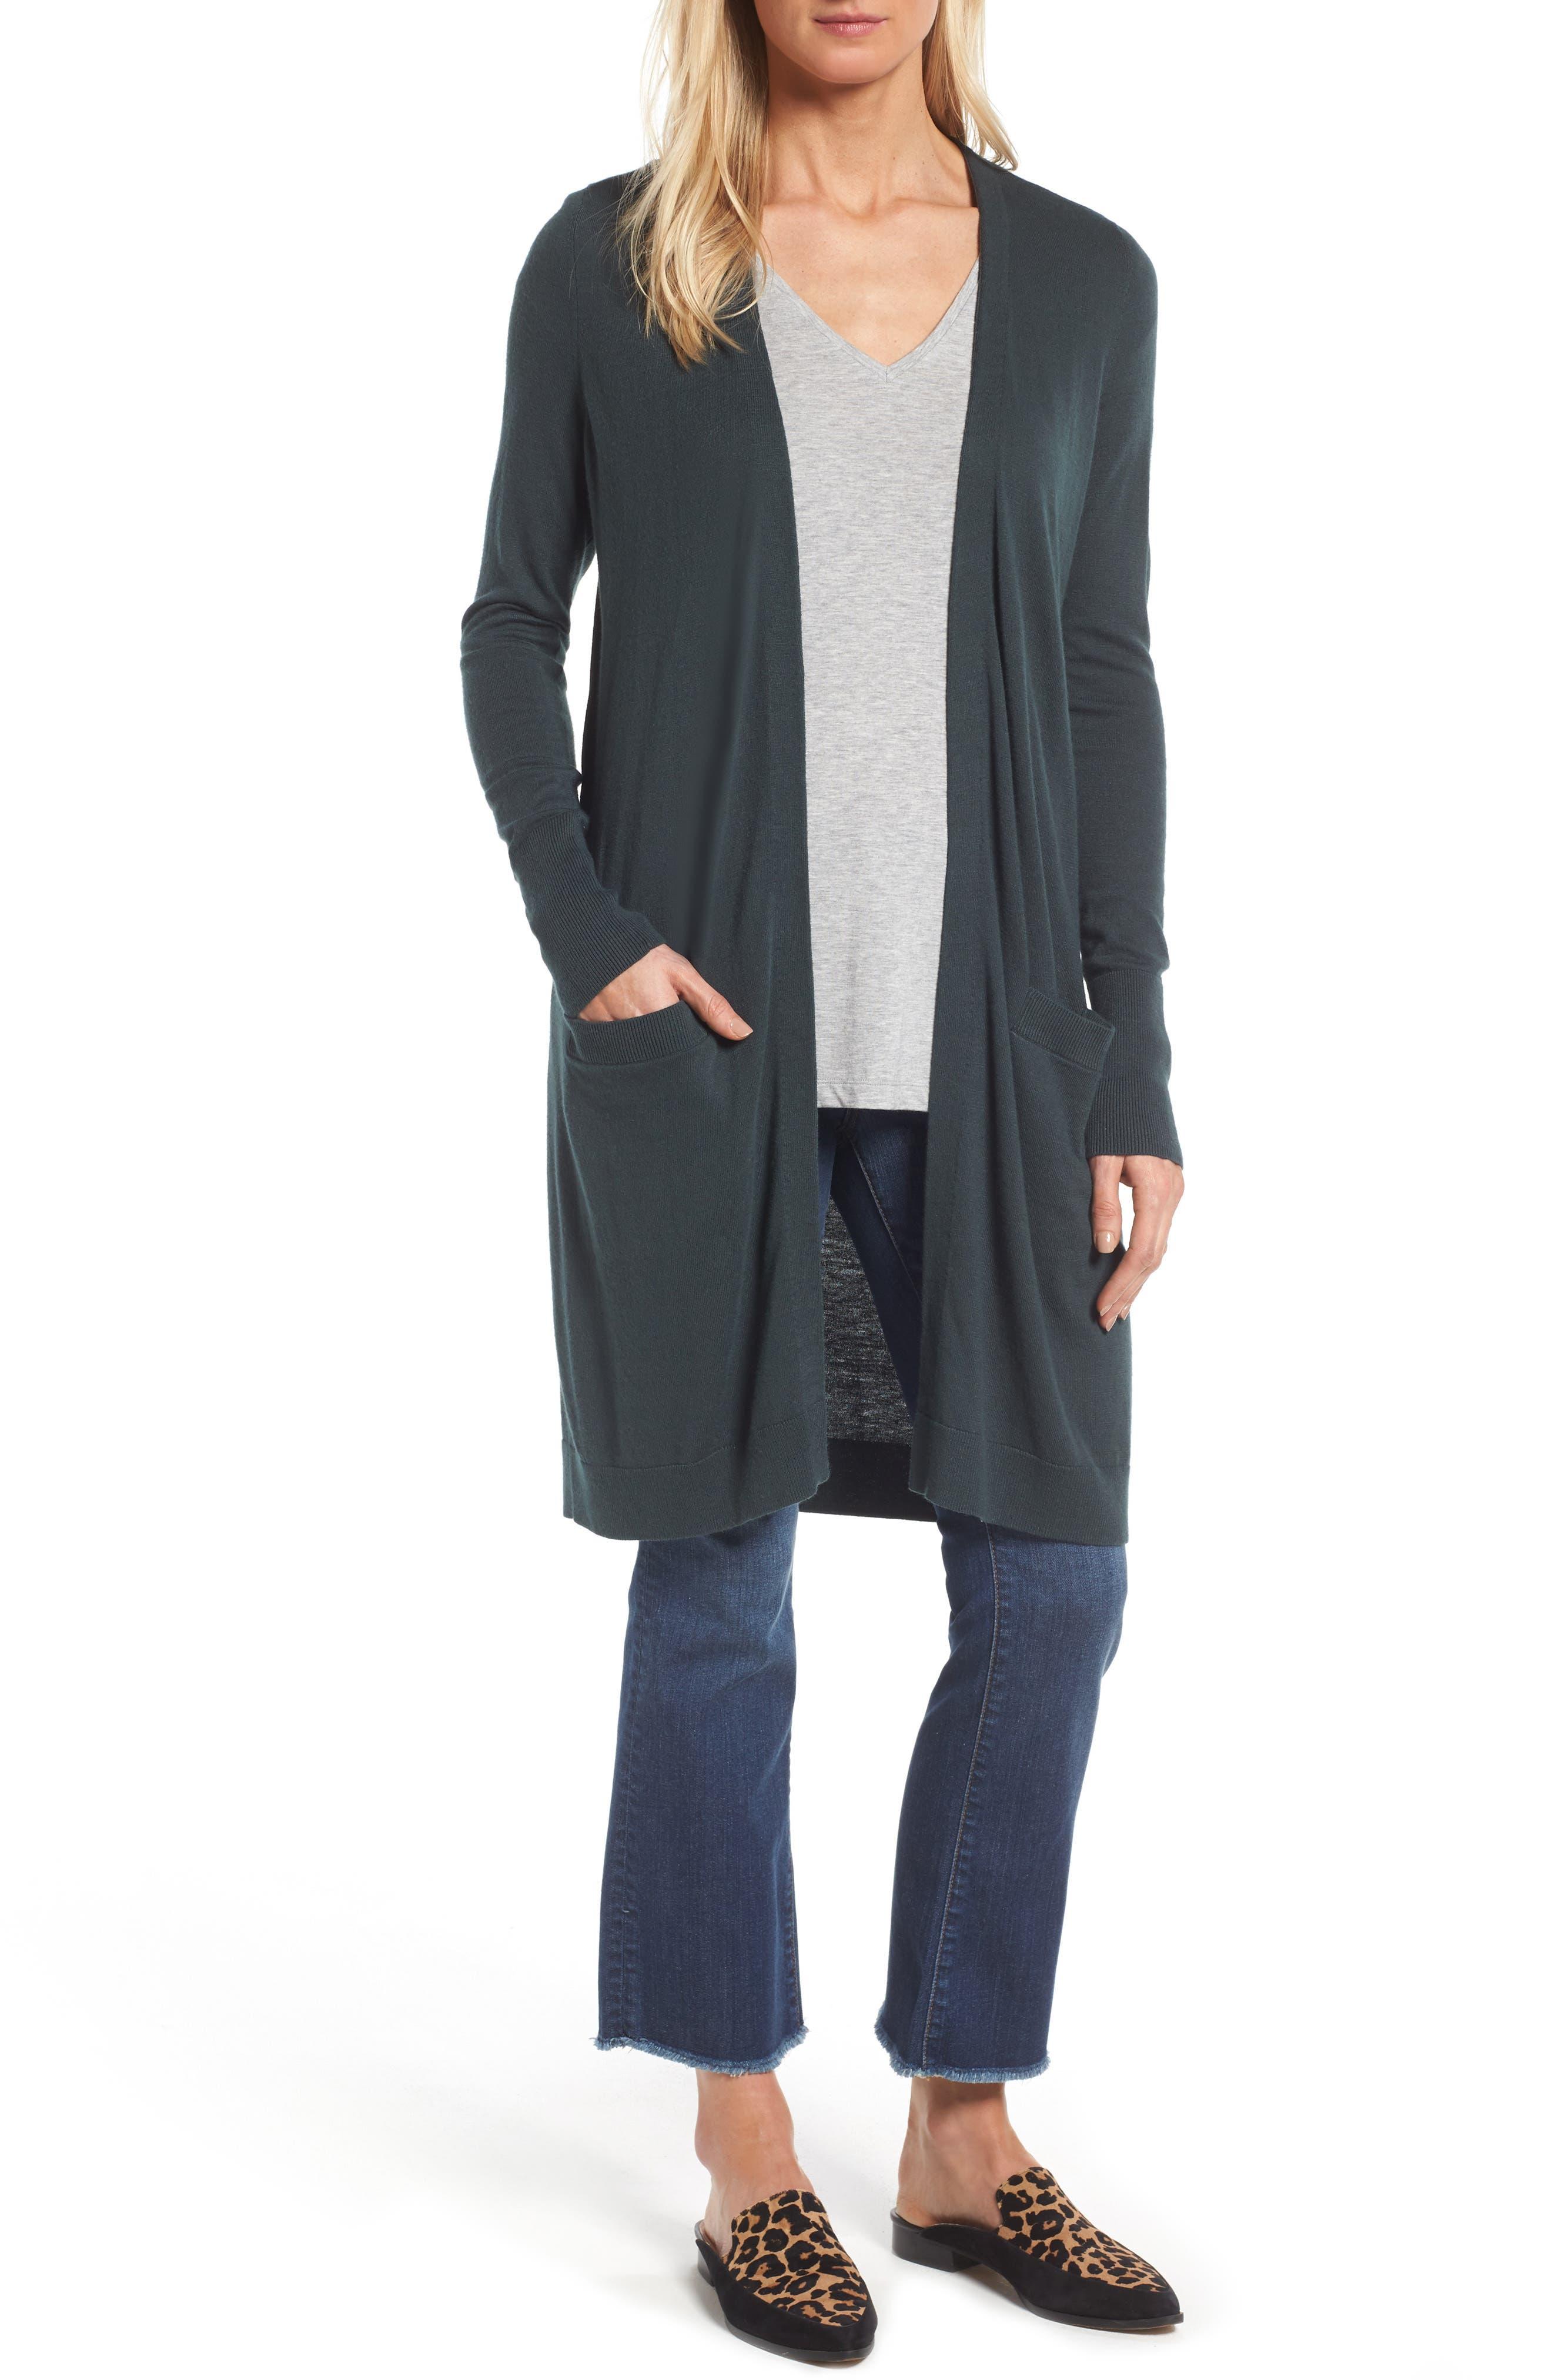 Alternate Image 1 Selected - Halogen® Long Open Front Cardigan (Regular & Petite)